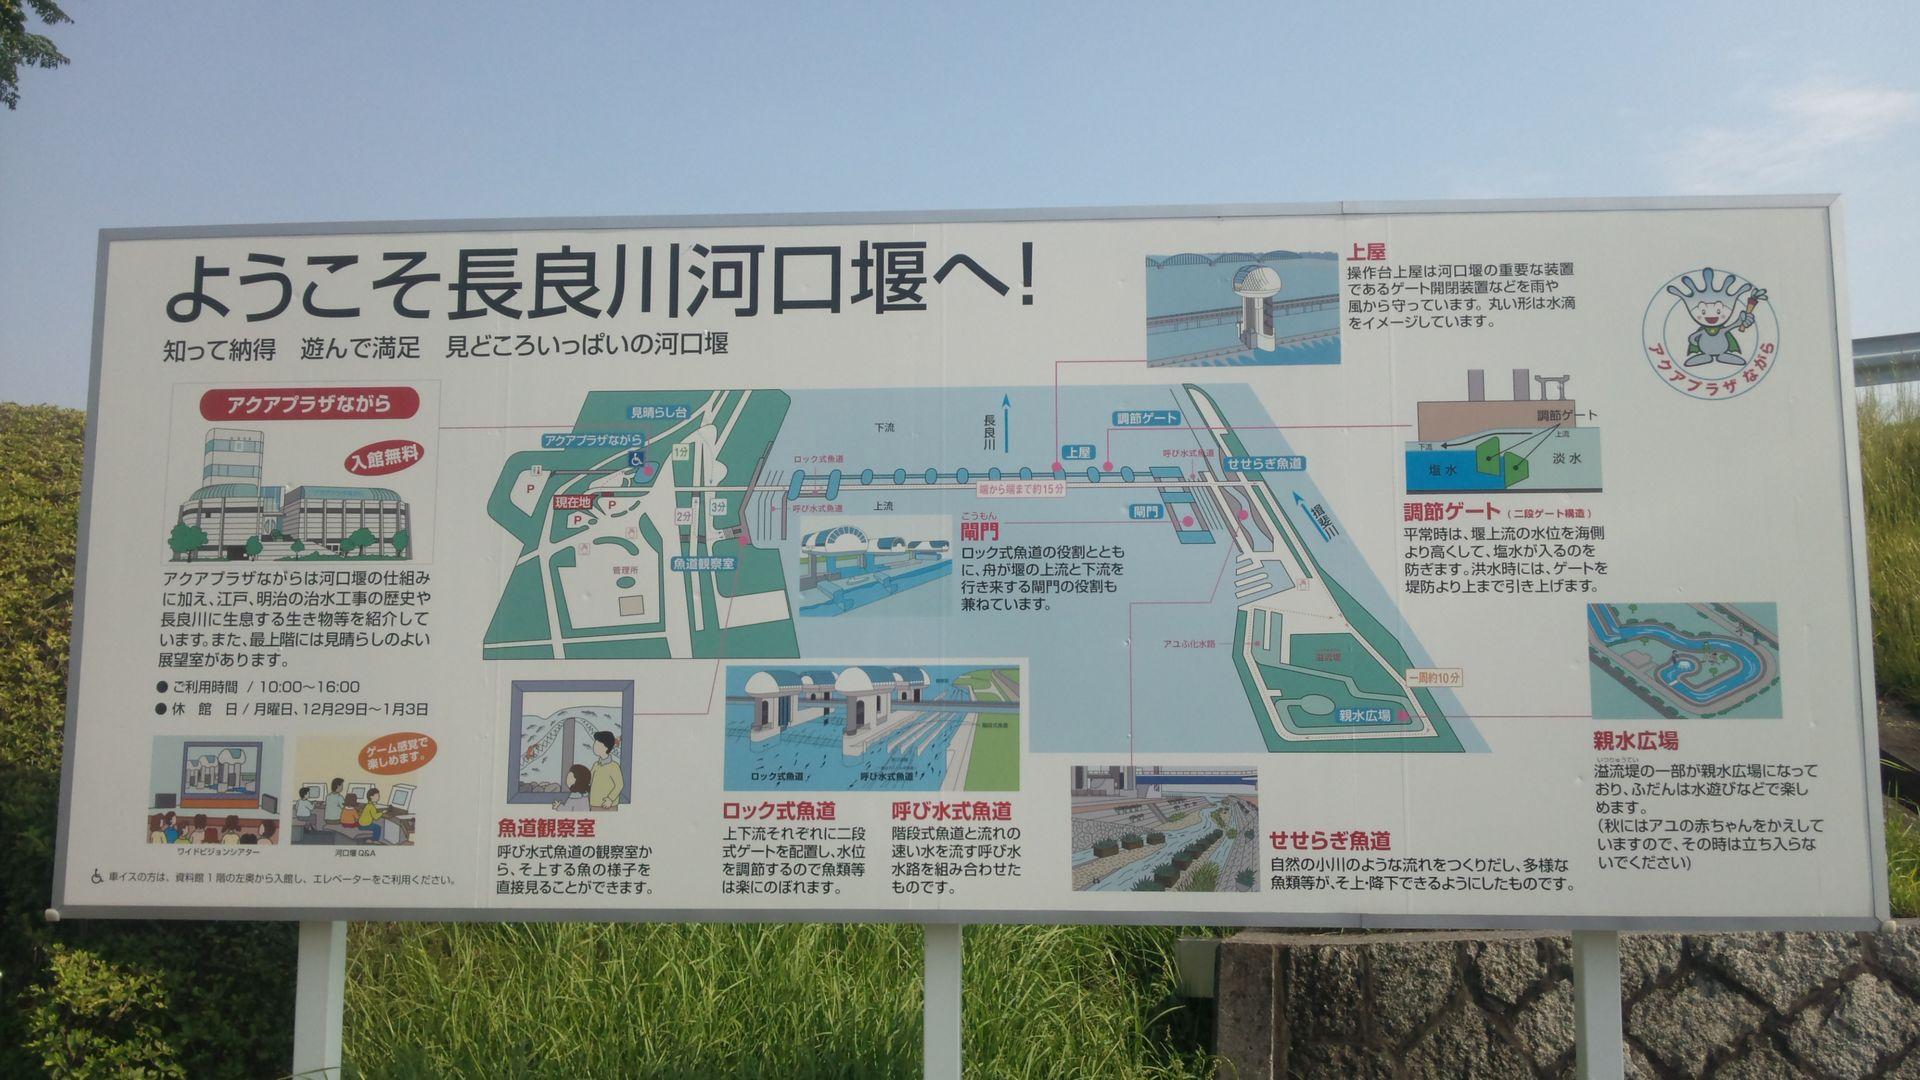 kakoshinsui01.jpg